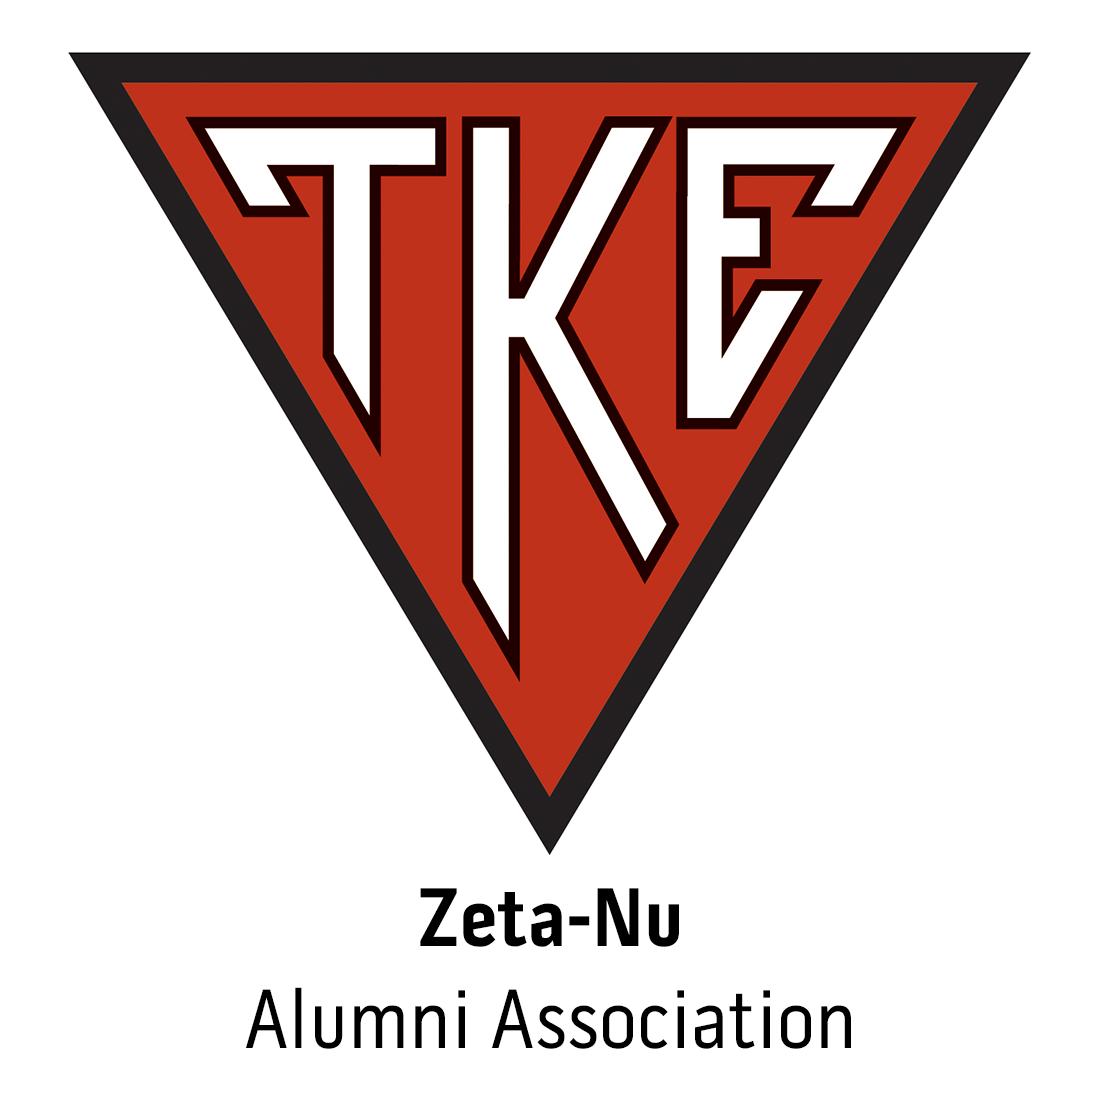 Zeta-Nu Alumni Association for Valdosta State University